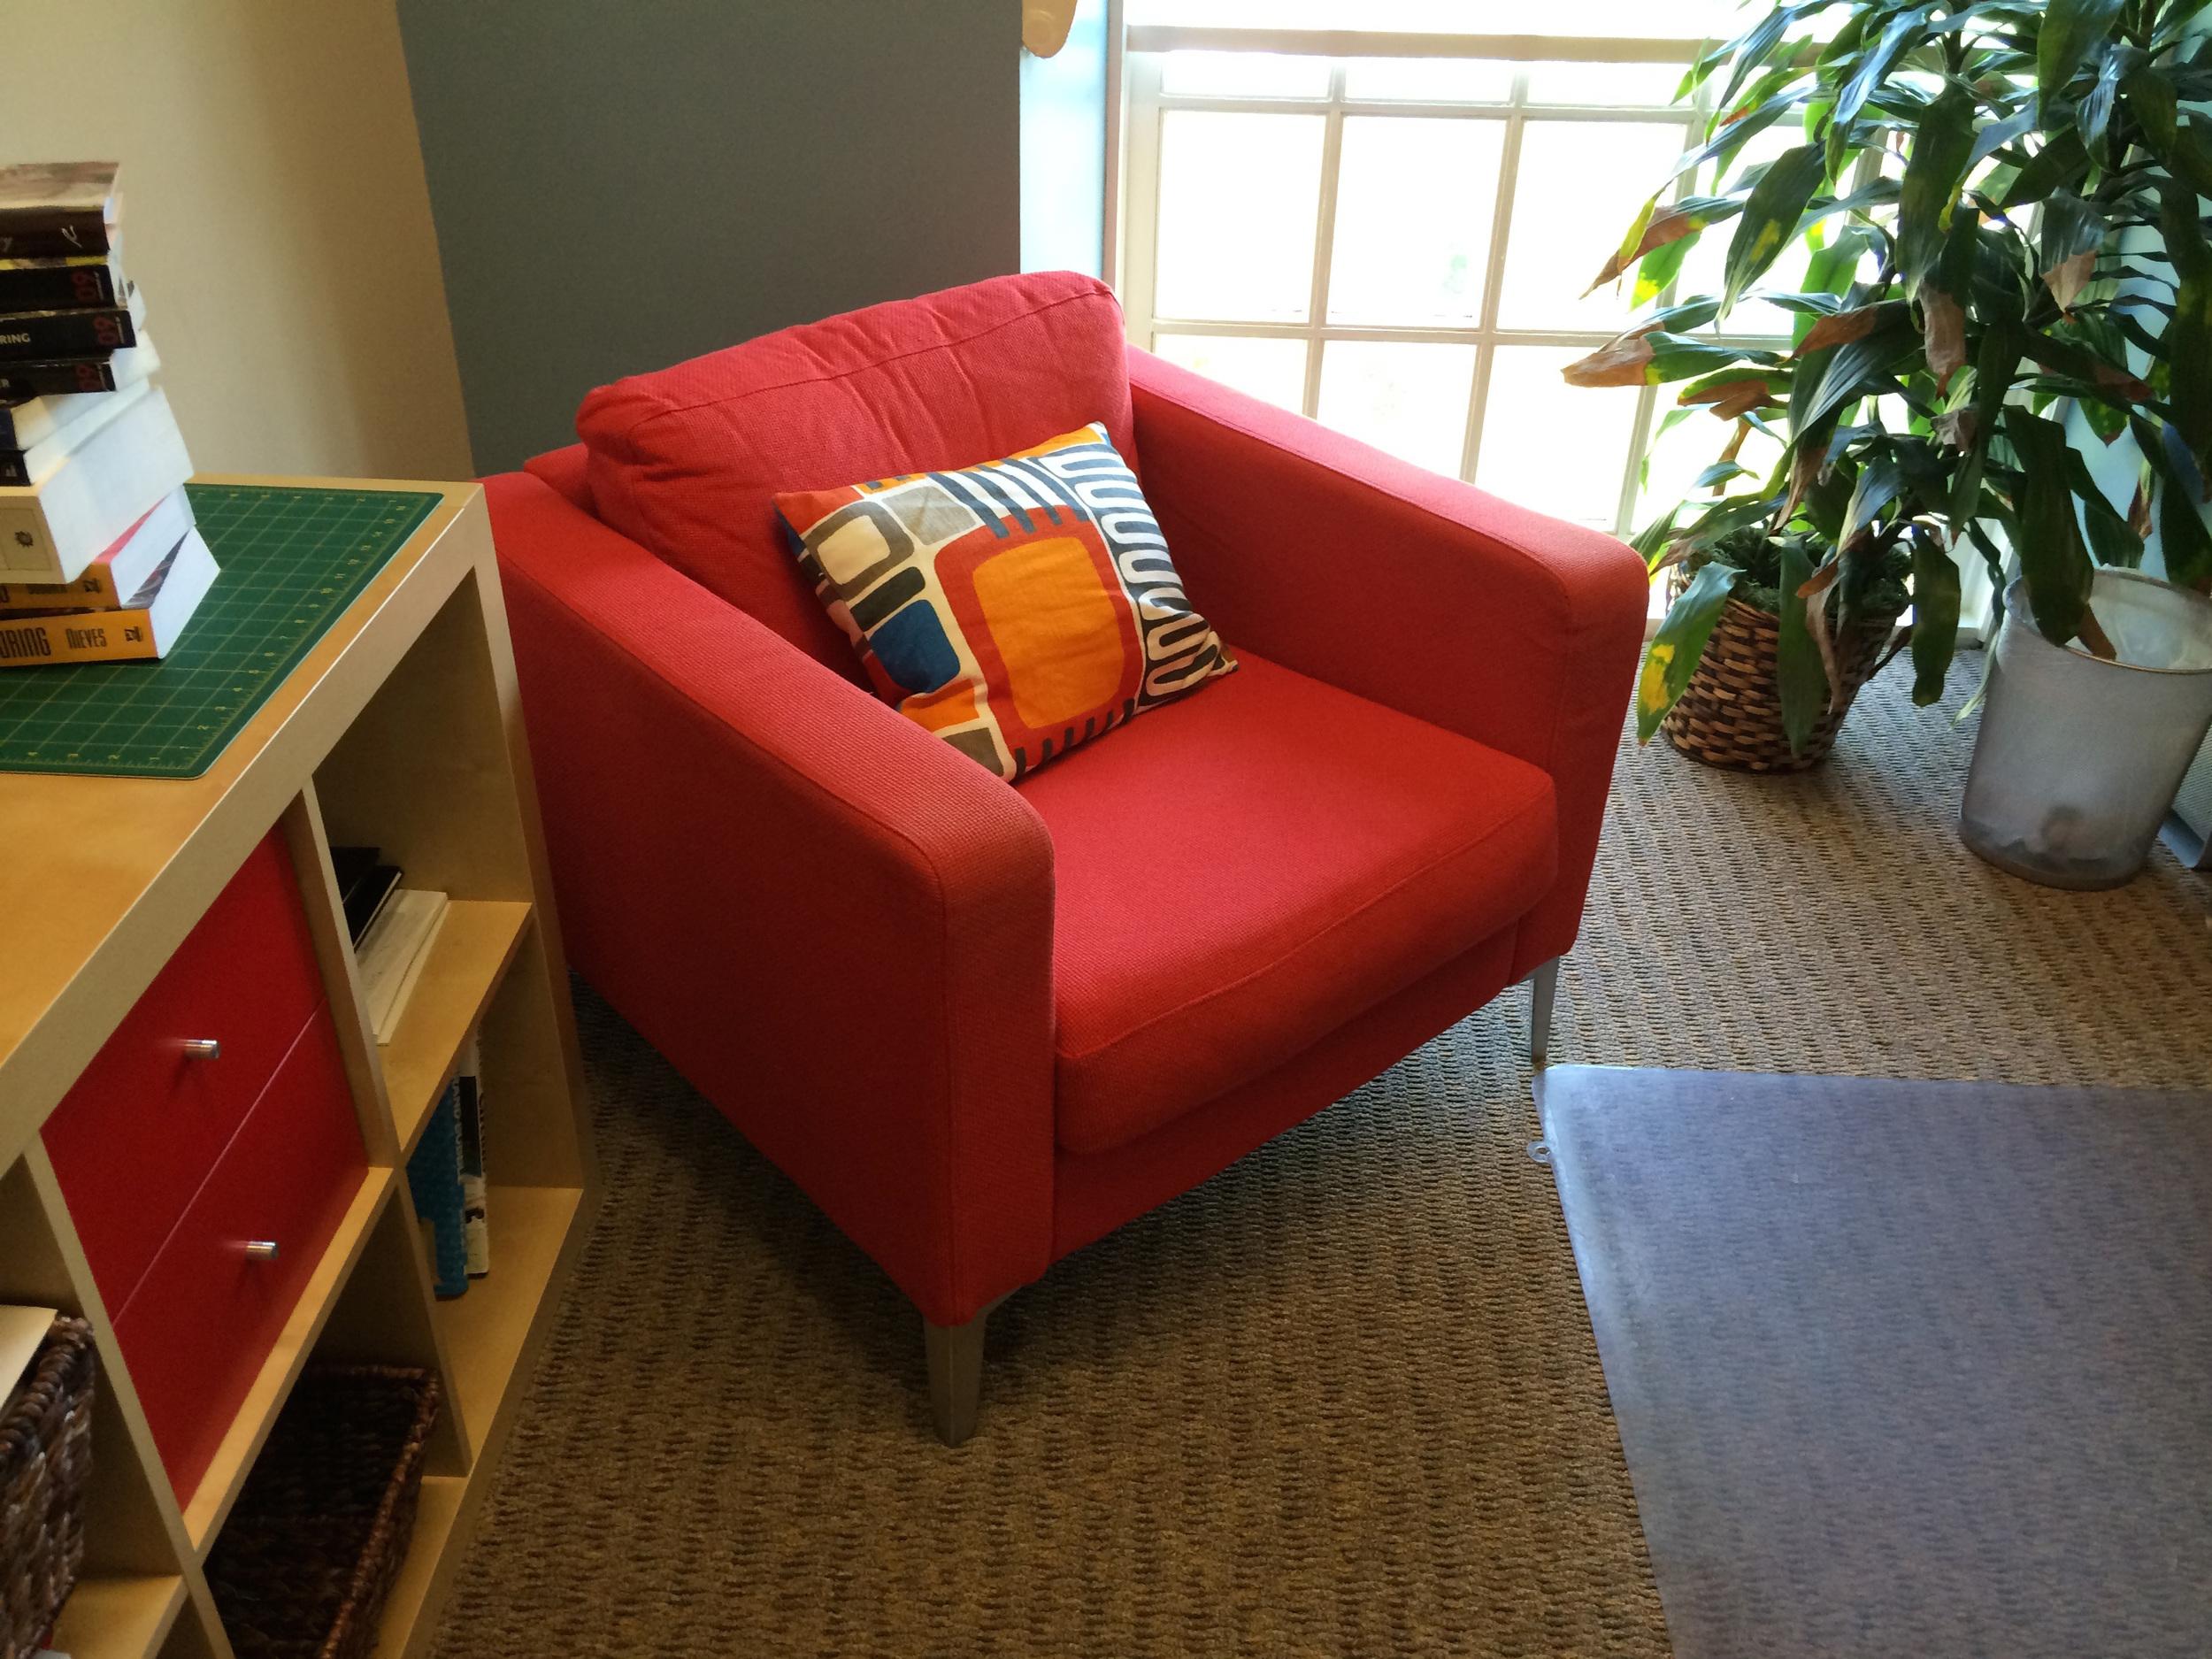 redchairs2.jpg